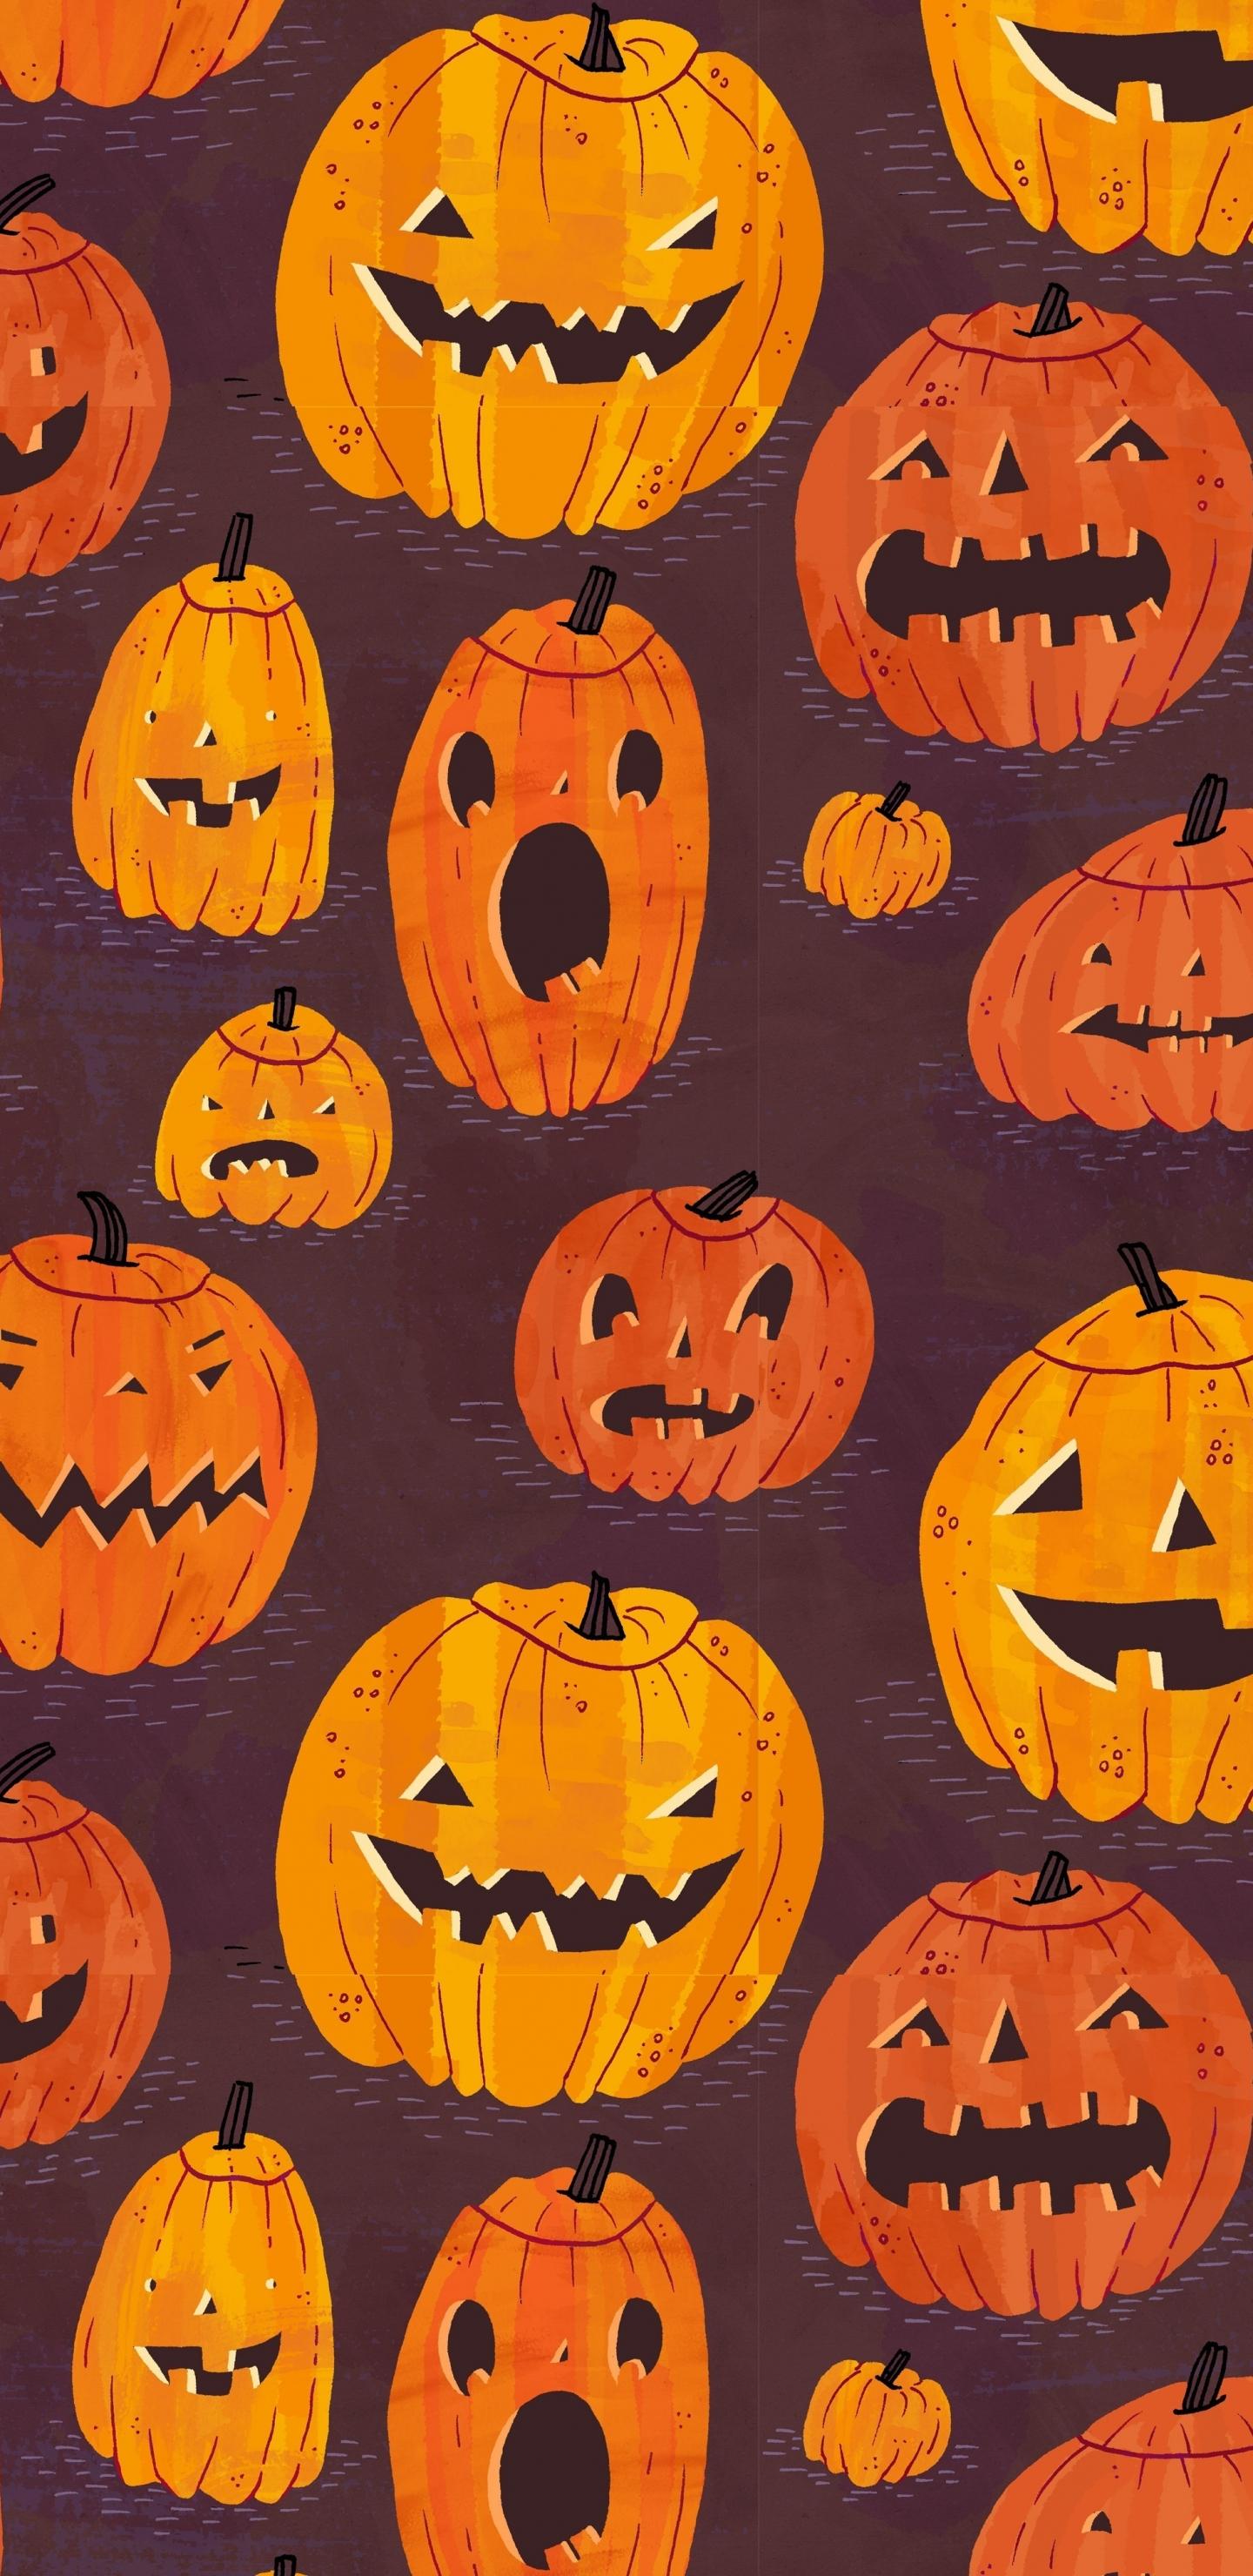 Download 1440x2960 Wallpaper Pumpkin Pattern Halloween Samsung Galaxy S8 Samsung Galaxy S8 Plus 1440x2960 Hd Image Background 464